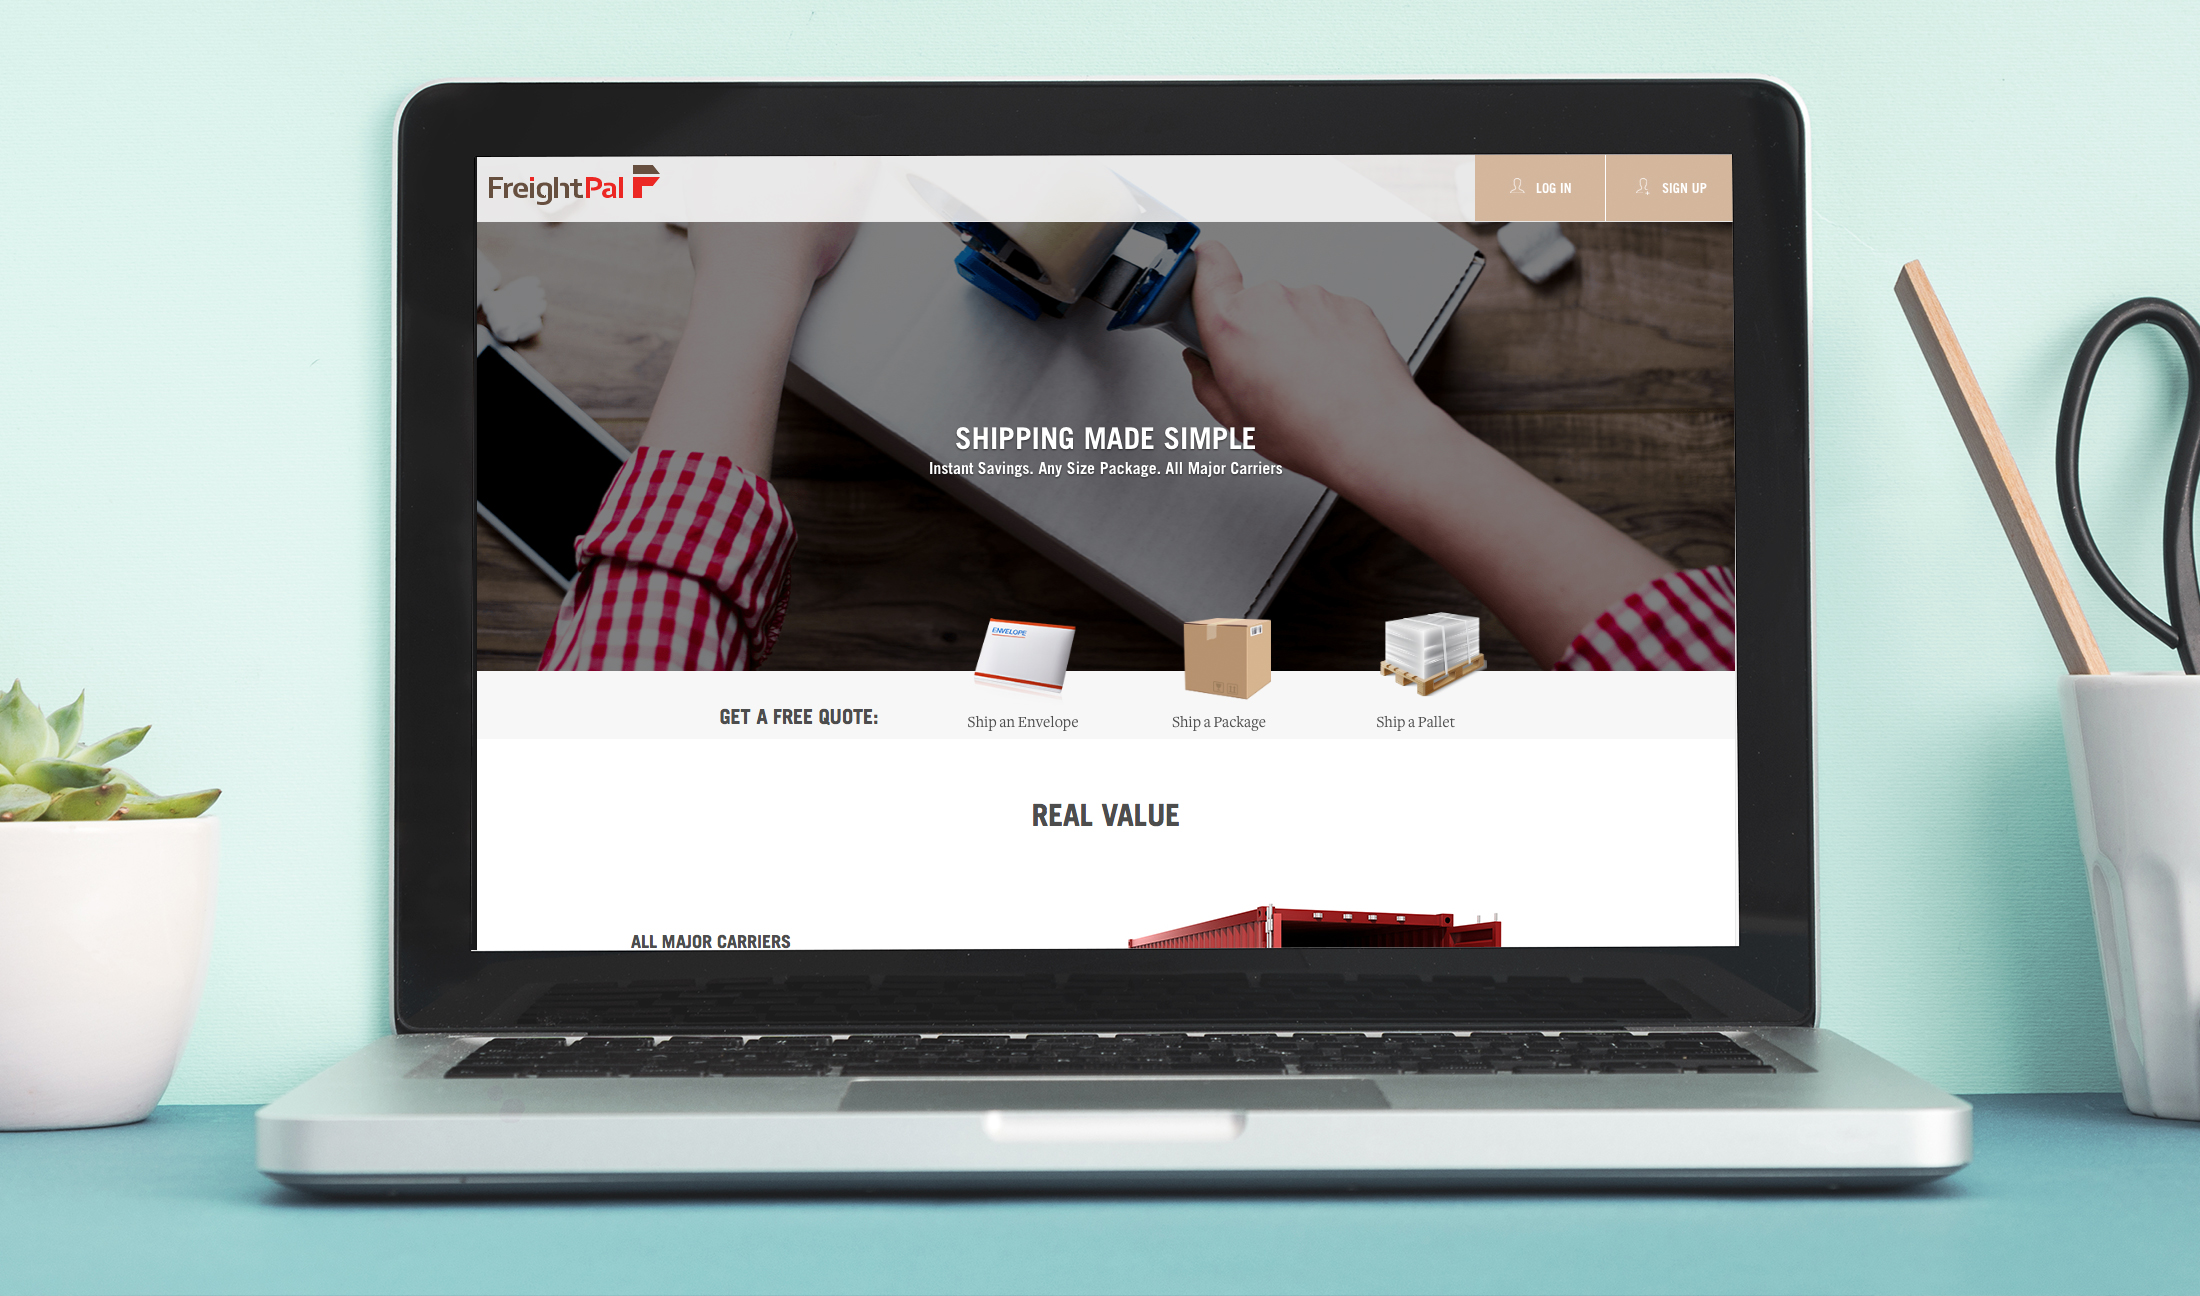 FreightPal: Website